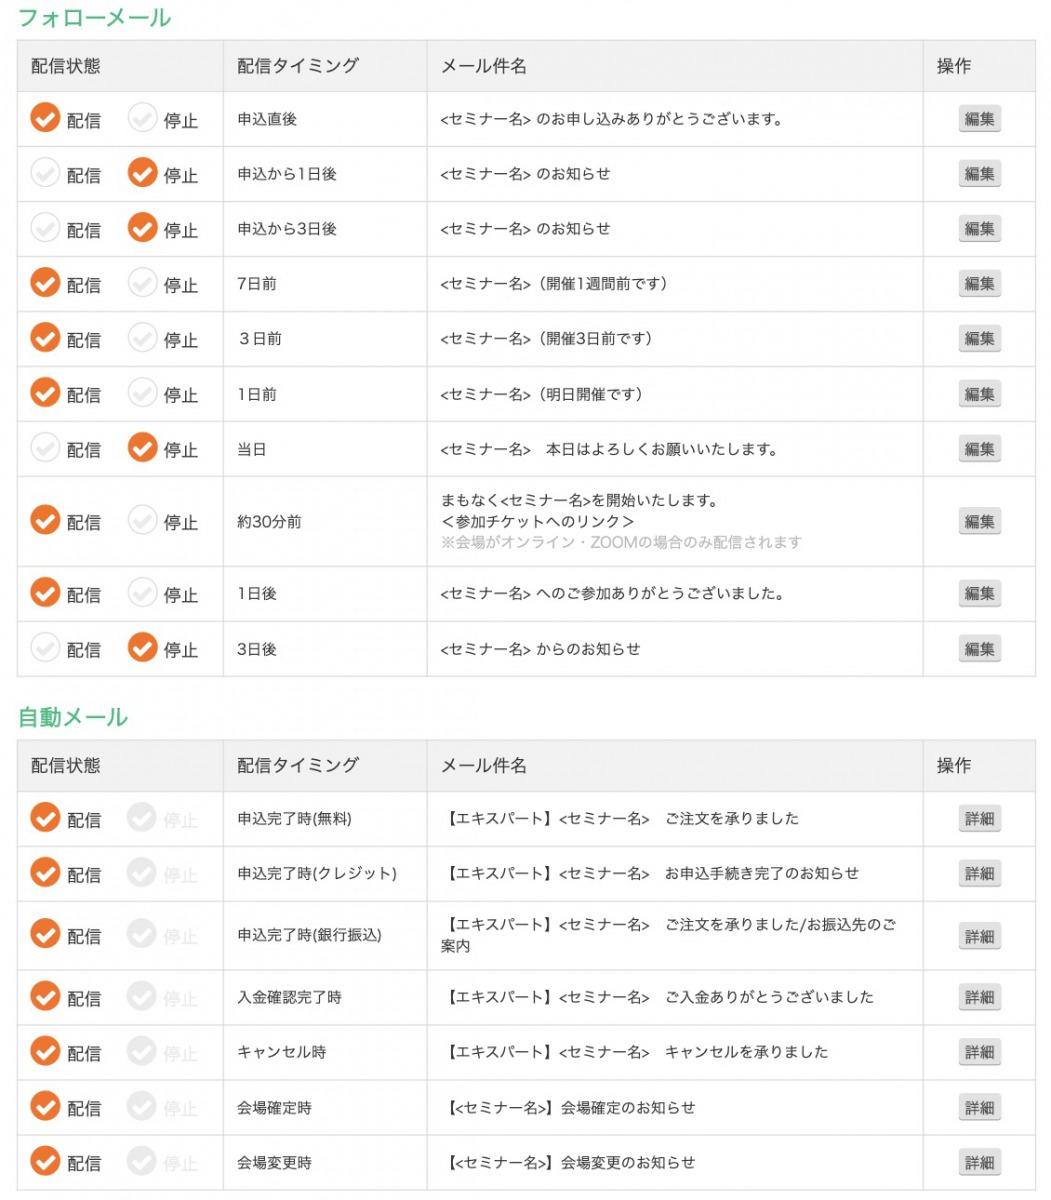 Zoomセミナー用の自動通知メール【エキスパ】